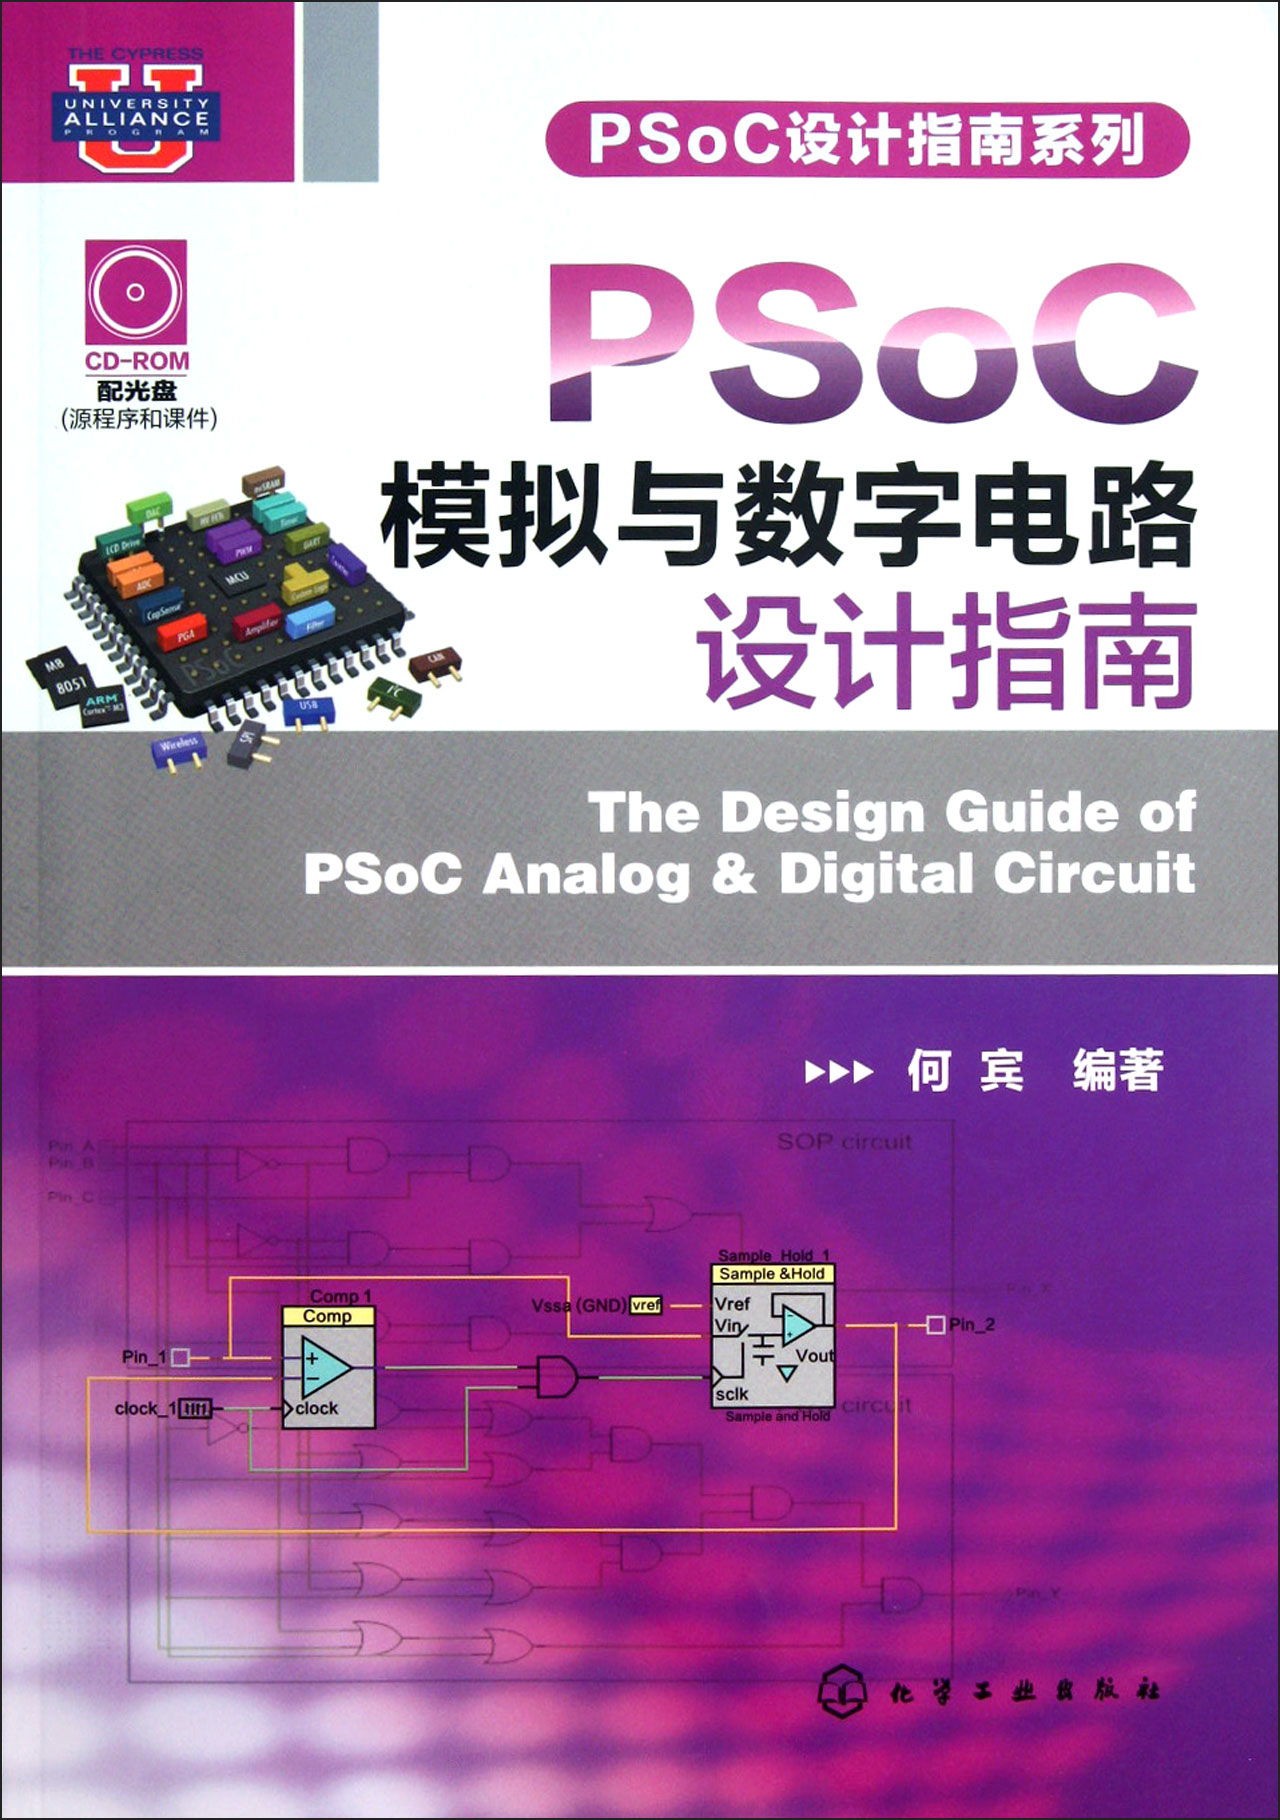 psoc模拟与数字电路设计指南(附光盘)